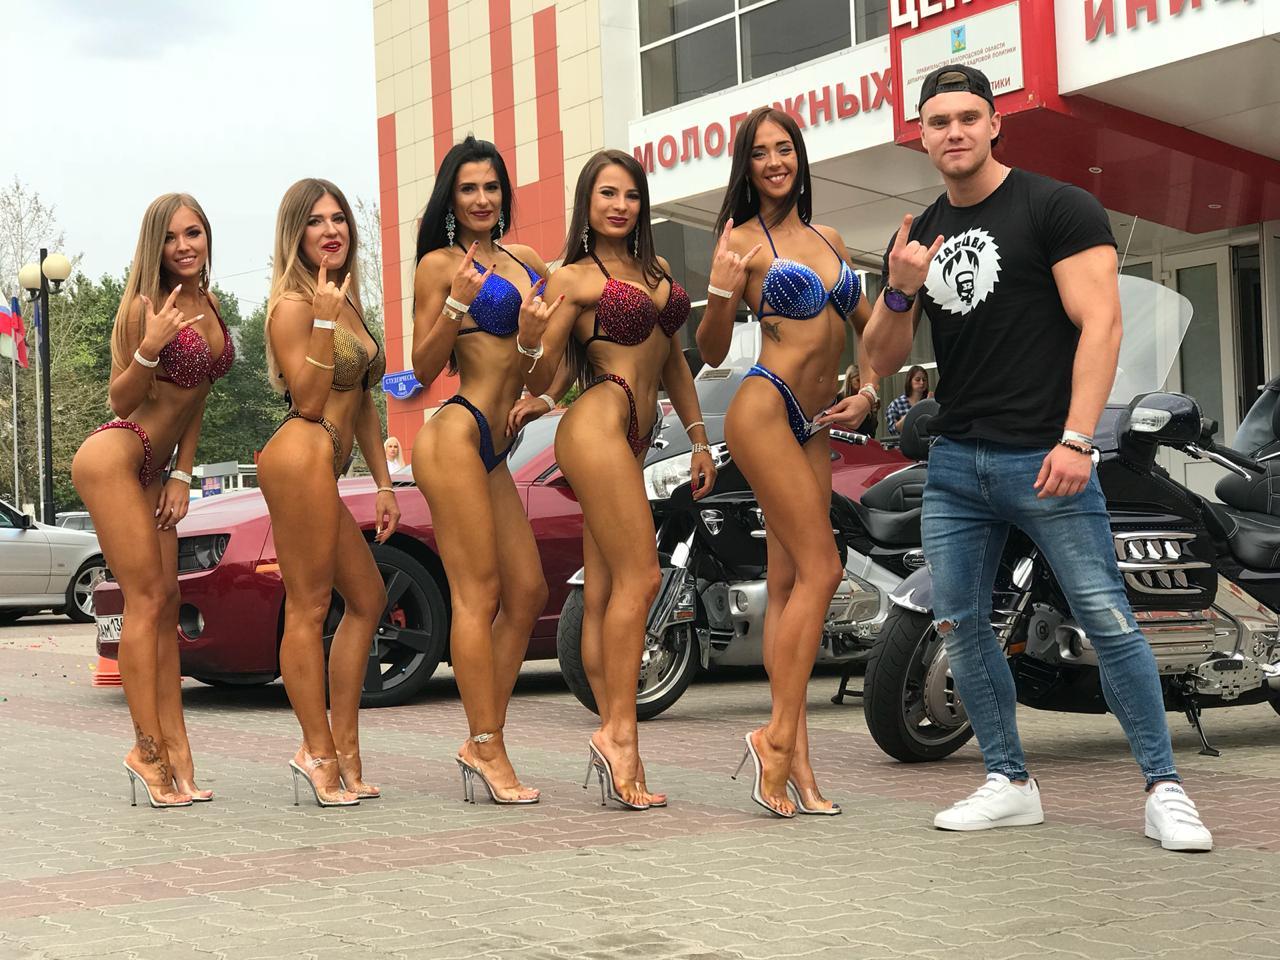 Брянские девушки поборются за звание «Мисс фитнес-бикини»